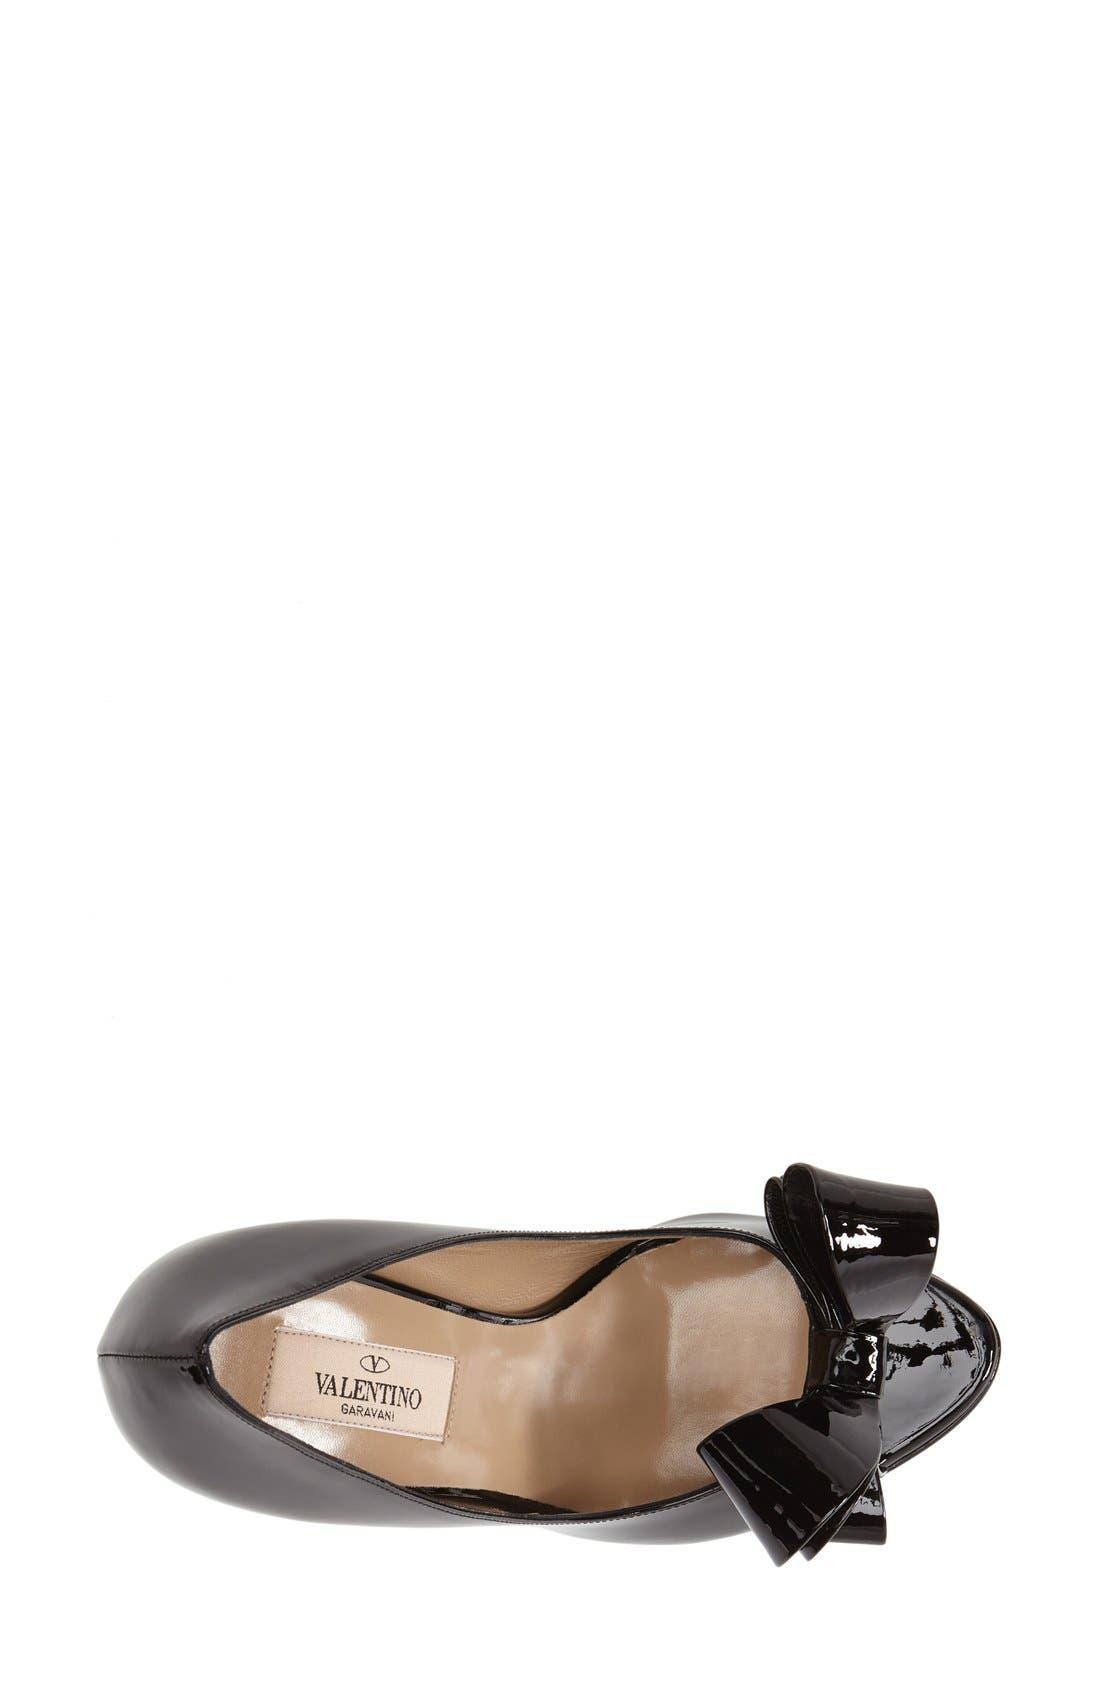 VALENTINO GARAVANI,                             Couture Bow Platform Pump,                             Alternate thumbnail 6, color,                             001